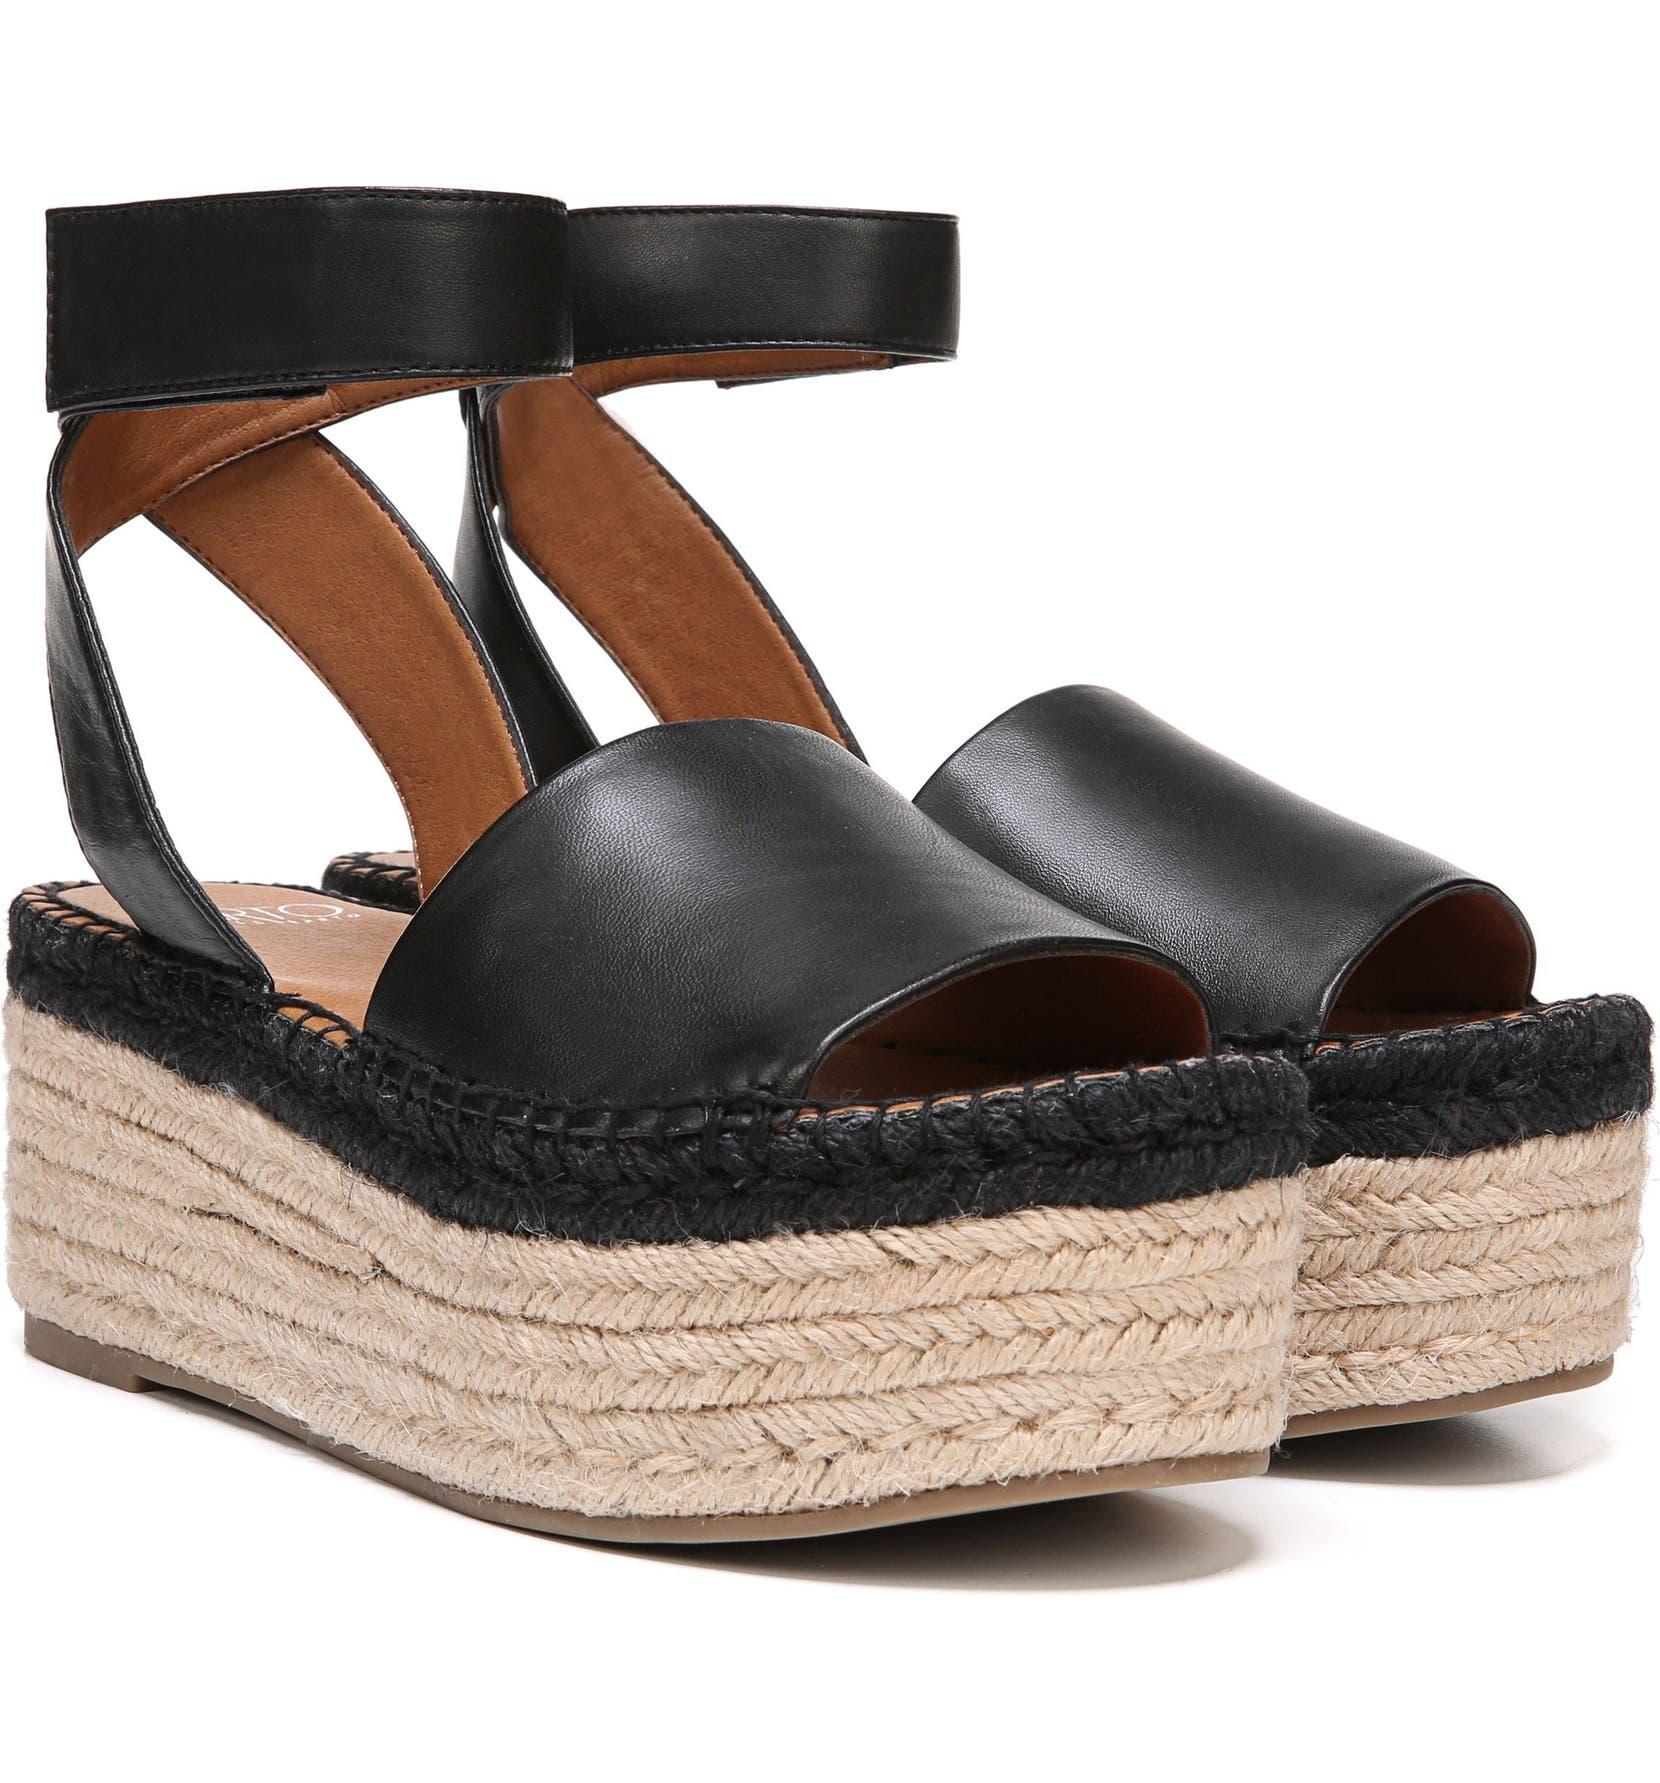 5aa153616ef SARTO by Franco Sarto Maisi Platform Espadrille Sandal (Women ...